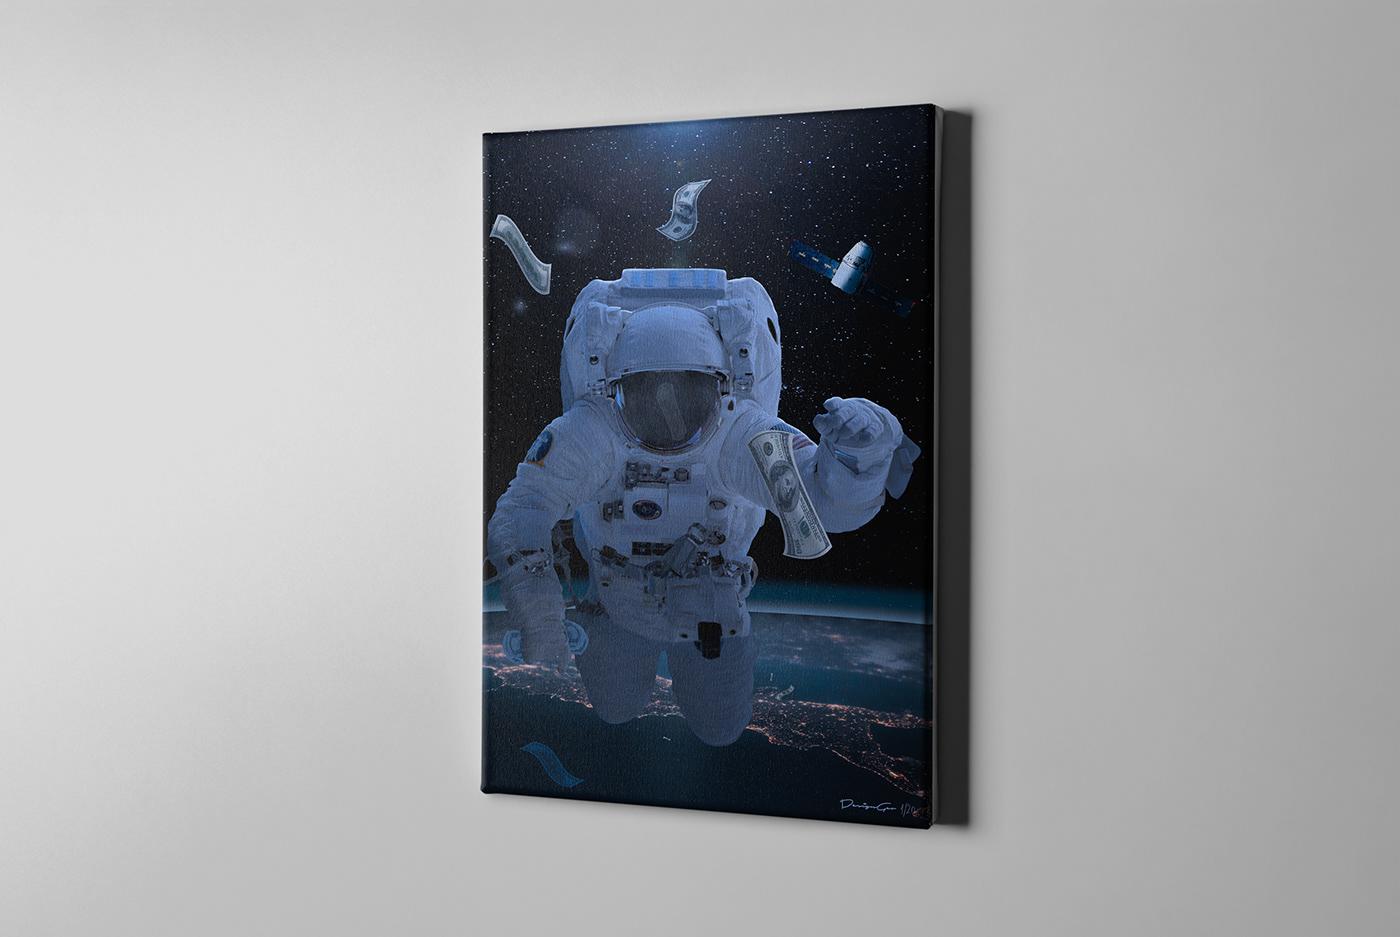 Gravity hundred photo manipulation canvas print. DesignGeo